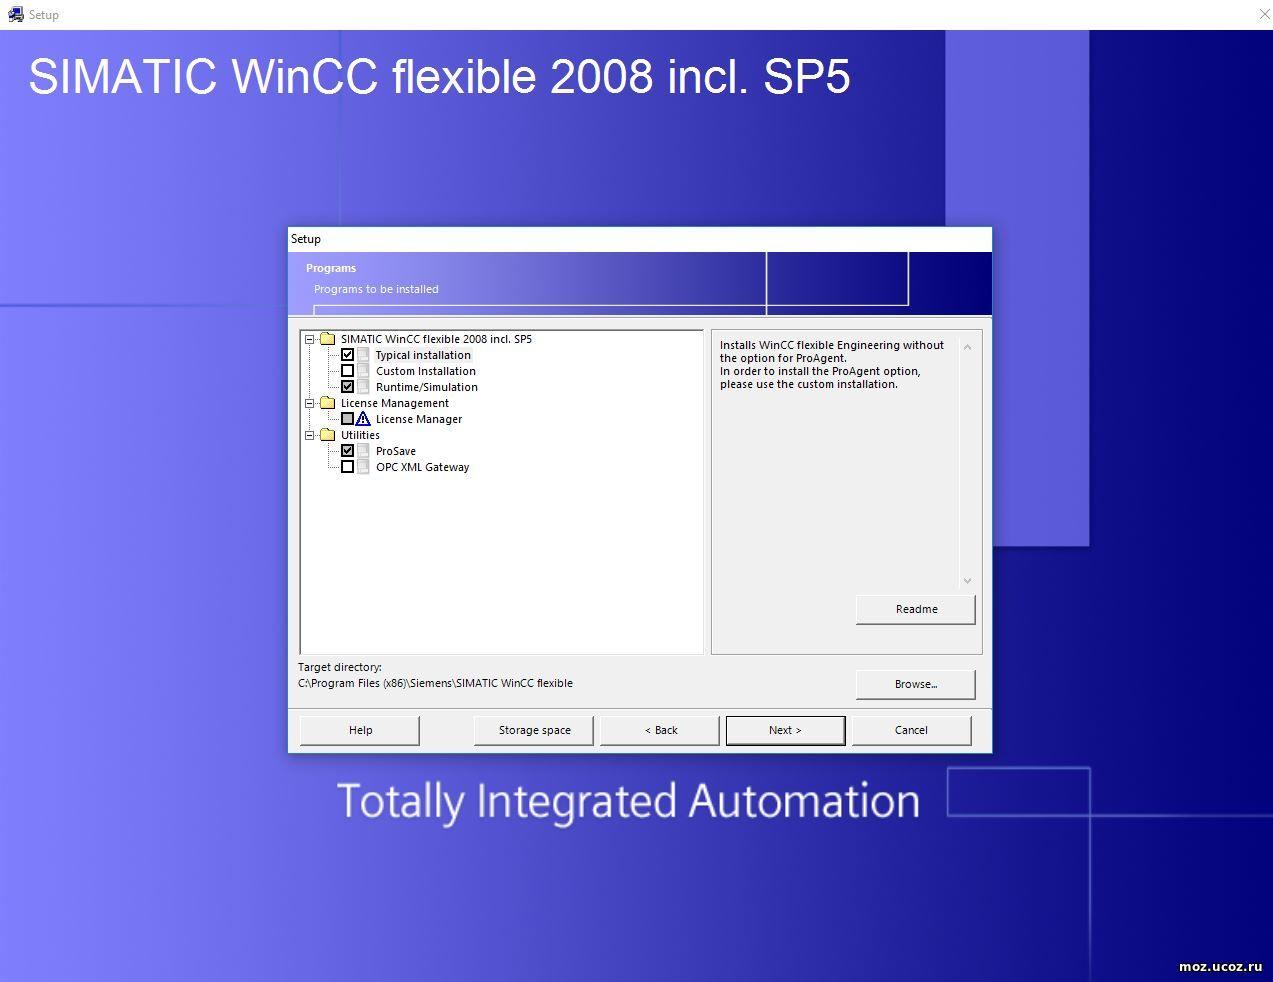 Siemens SIMATIC WinCC Flexible 2008 SP5 for Windows 10